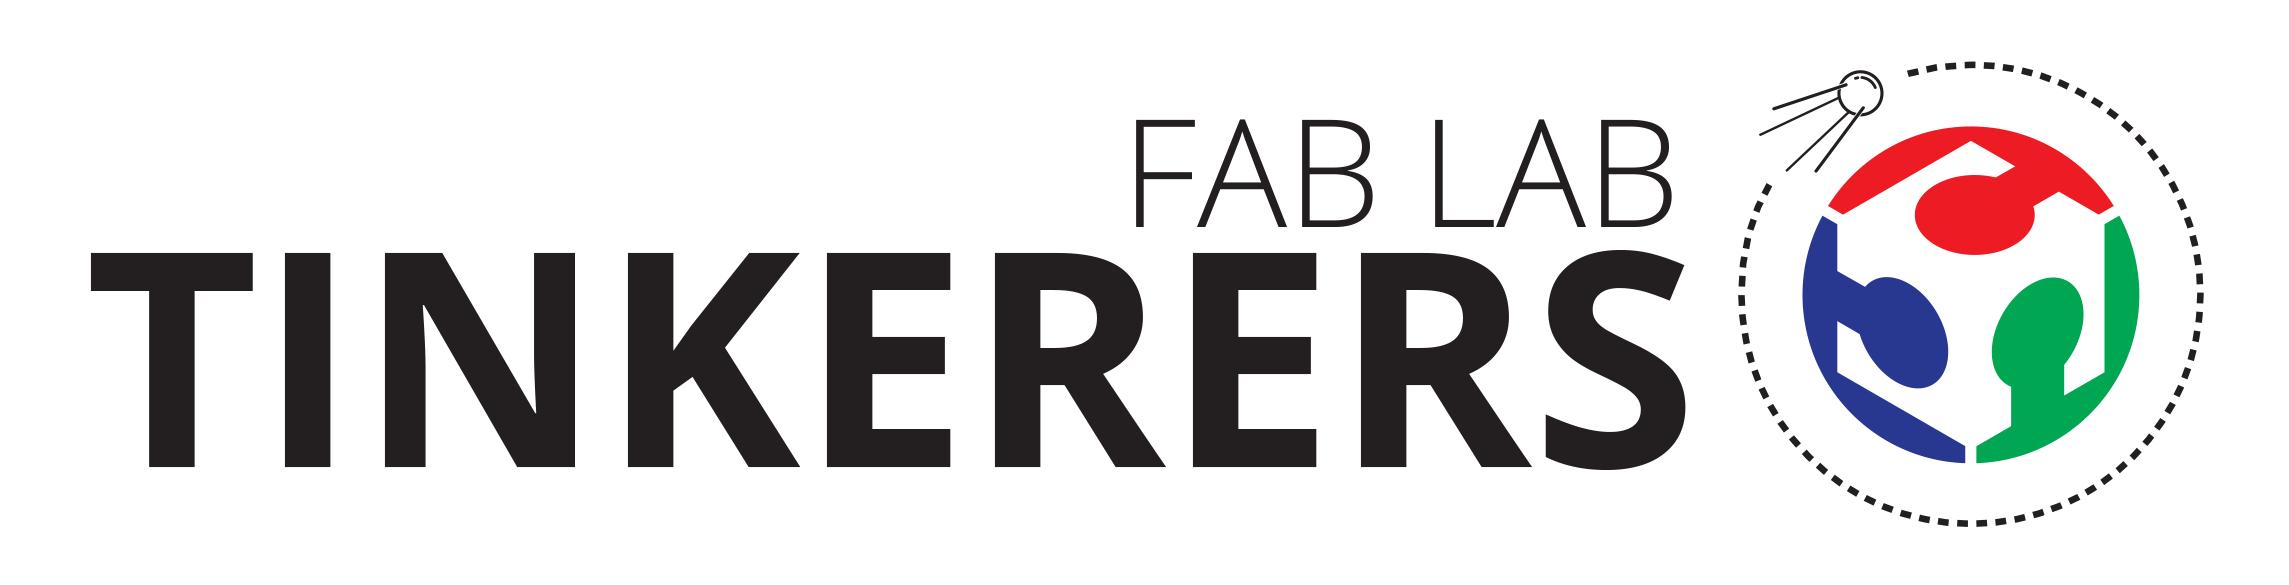 NEW-TINKERERS_logo_HD.jpg